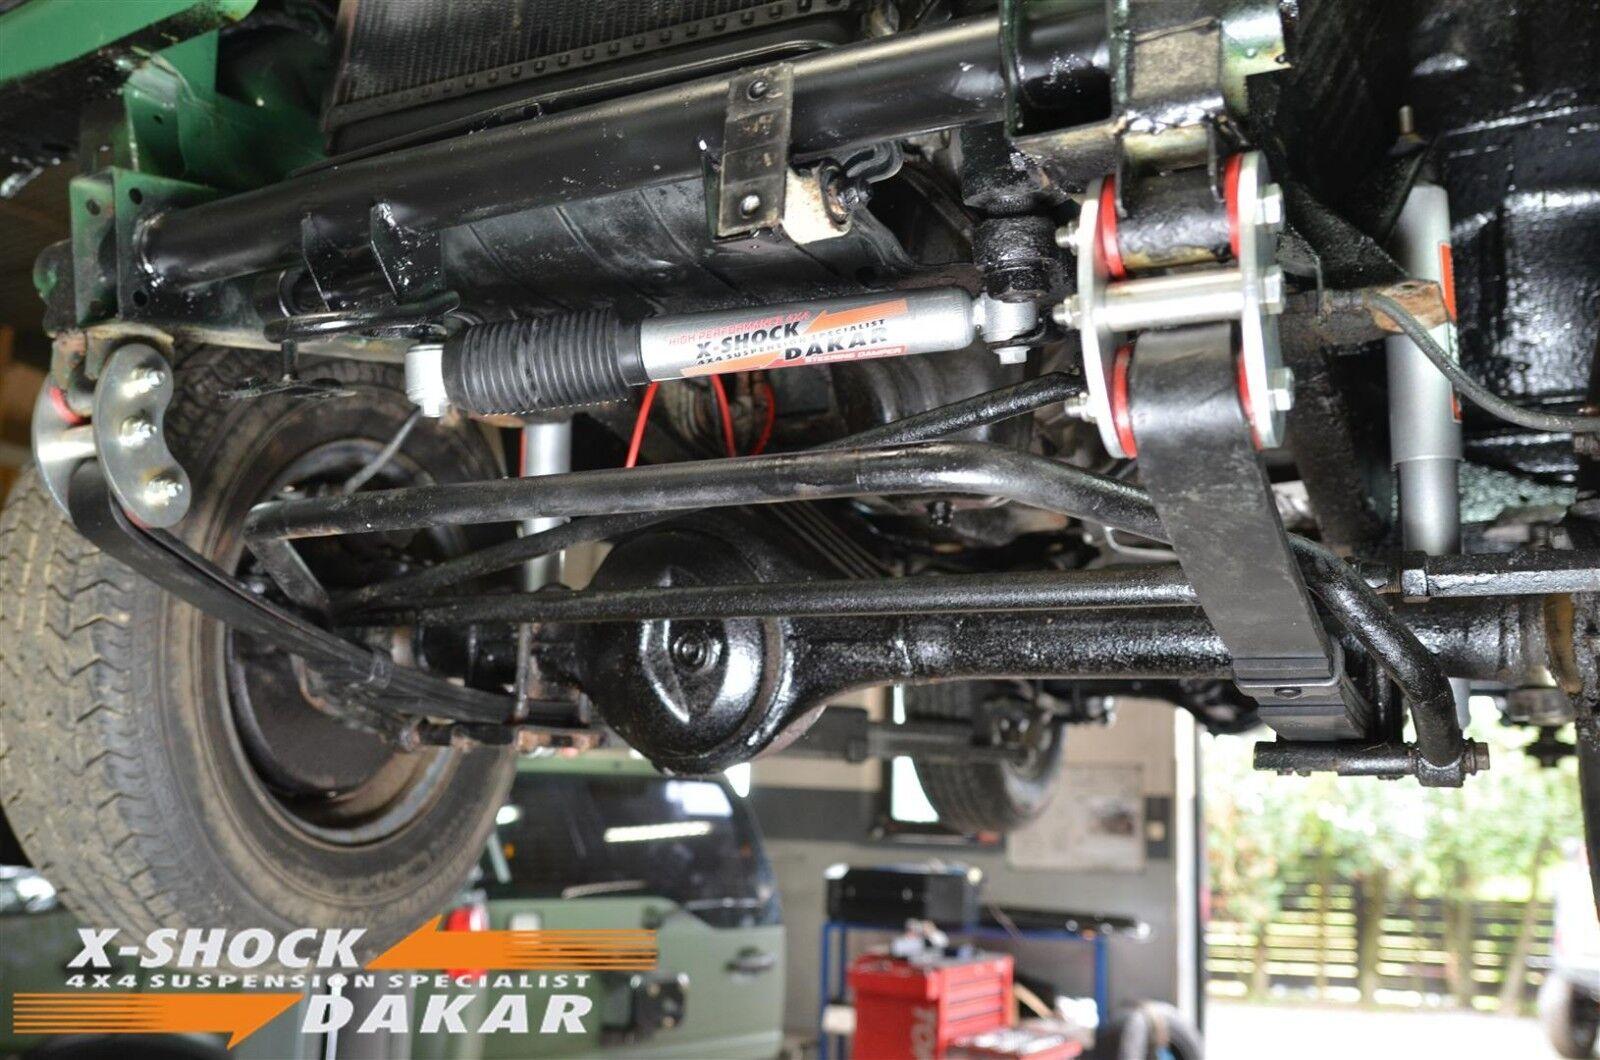 Steering Stabilizer Hd Suzuki Samurai Xshockdakar Ebay